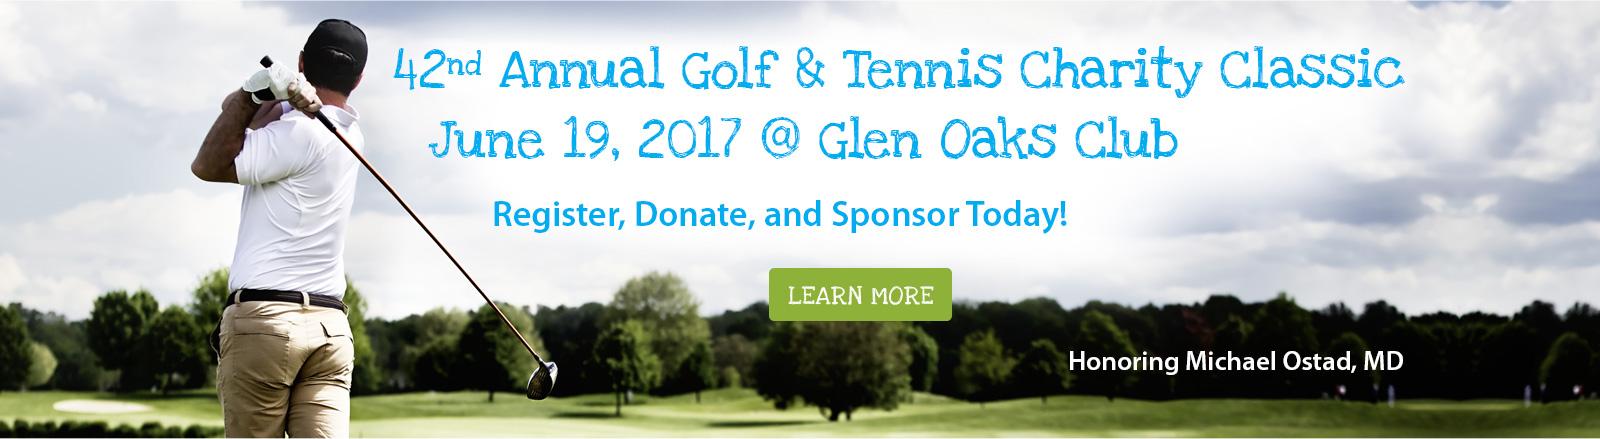 Website-GolfBanner-2